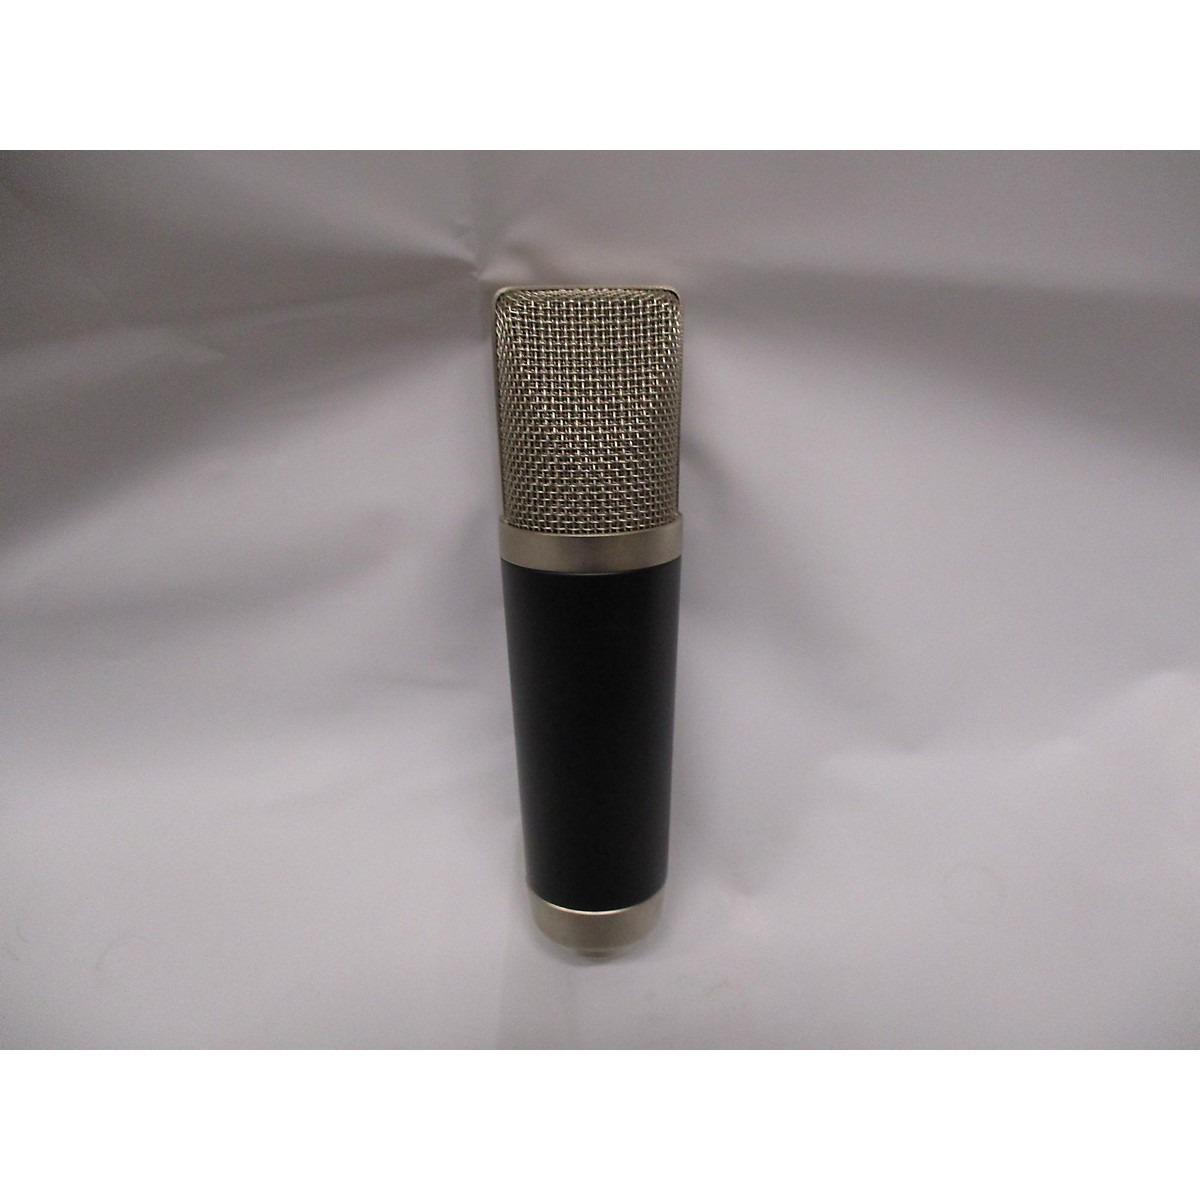 M-Audio PRODUCER USB USB Microphone